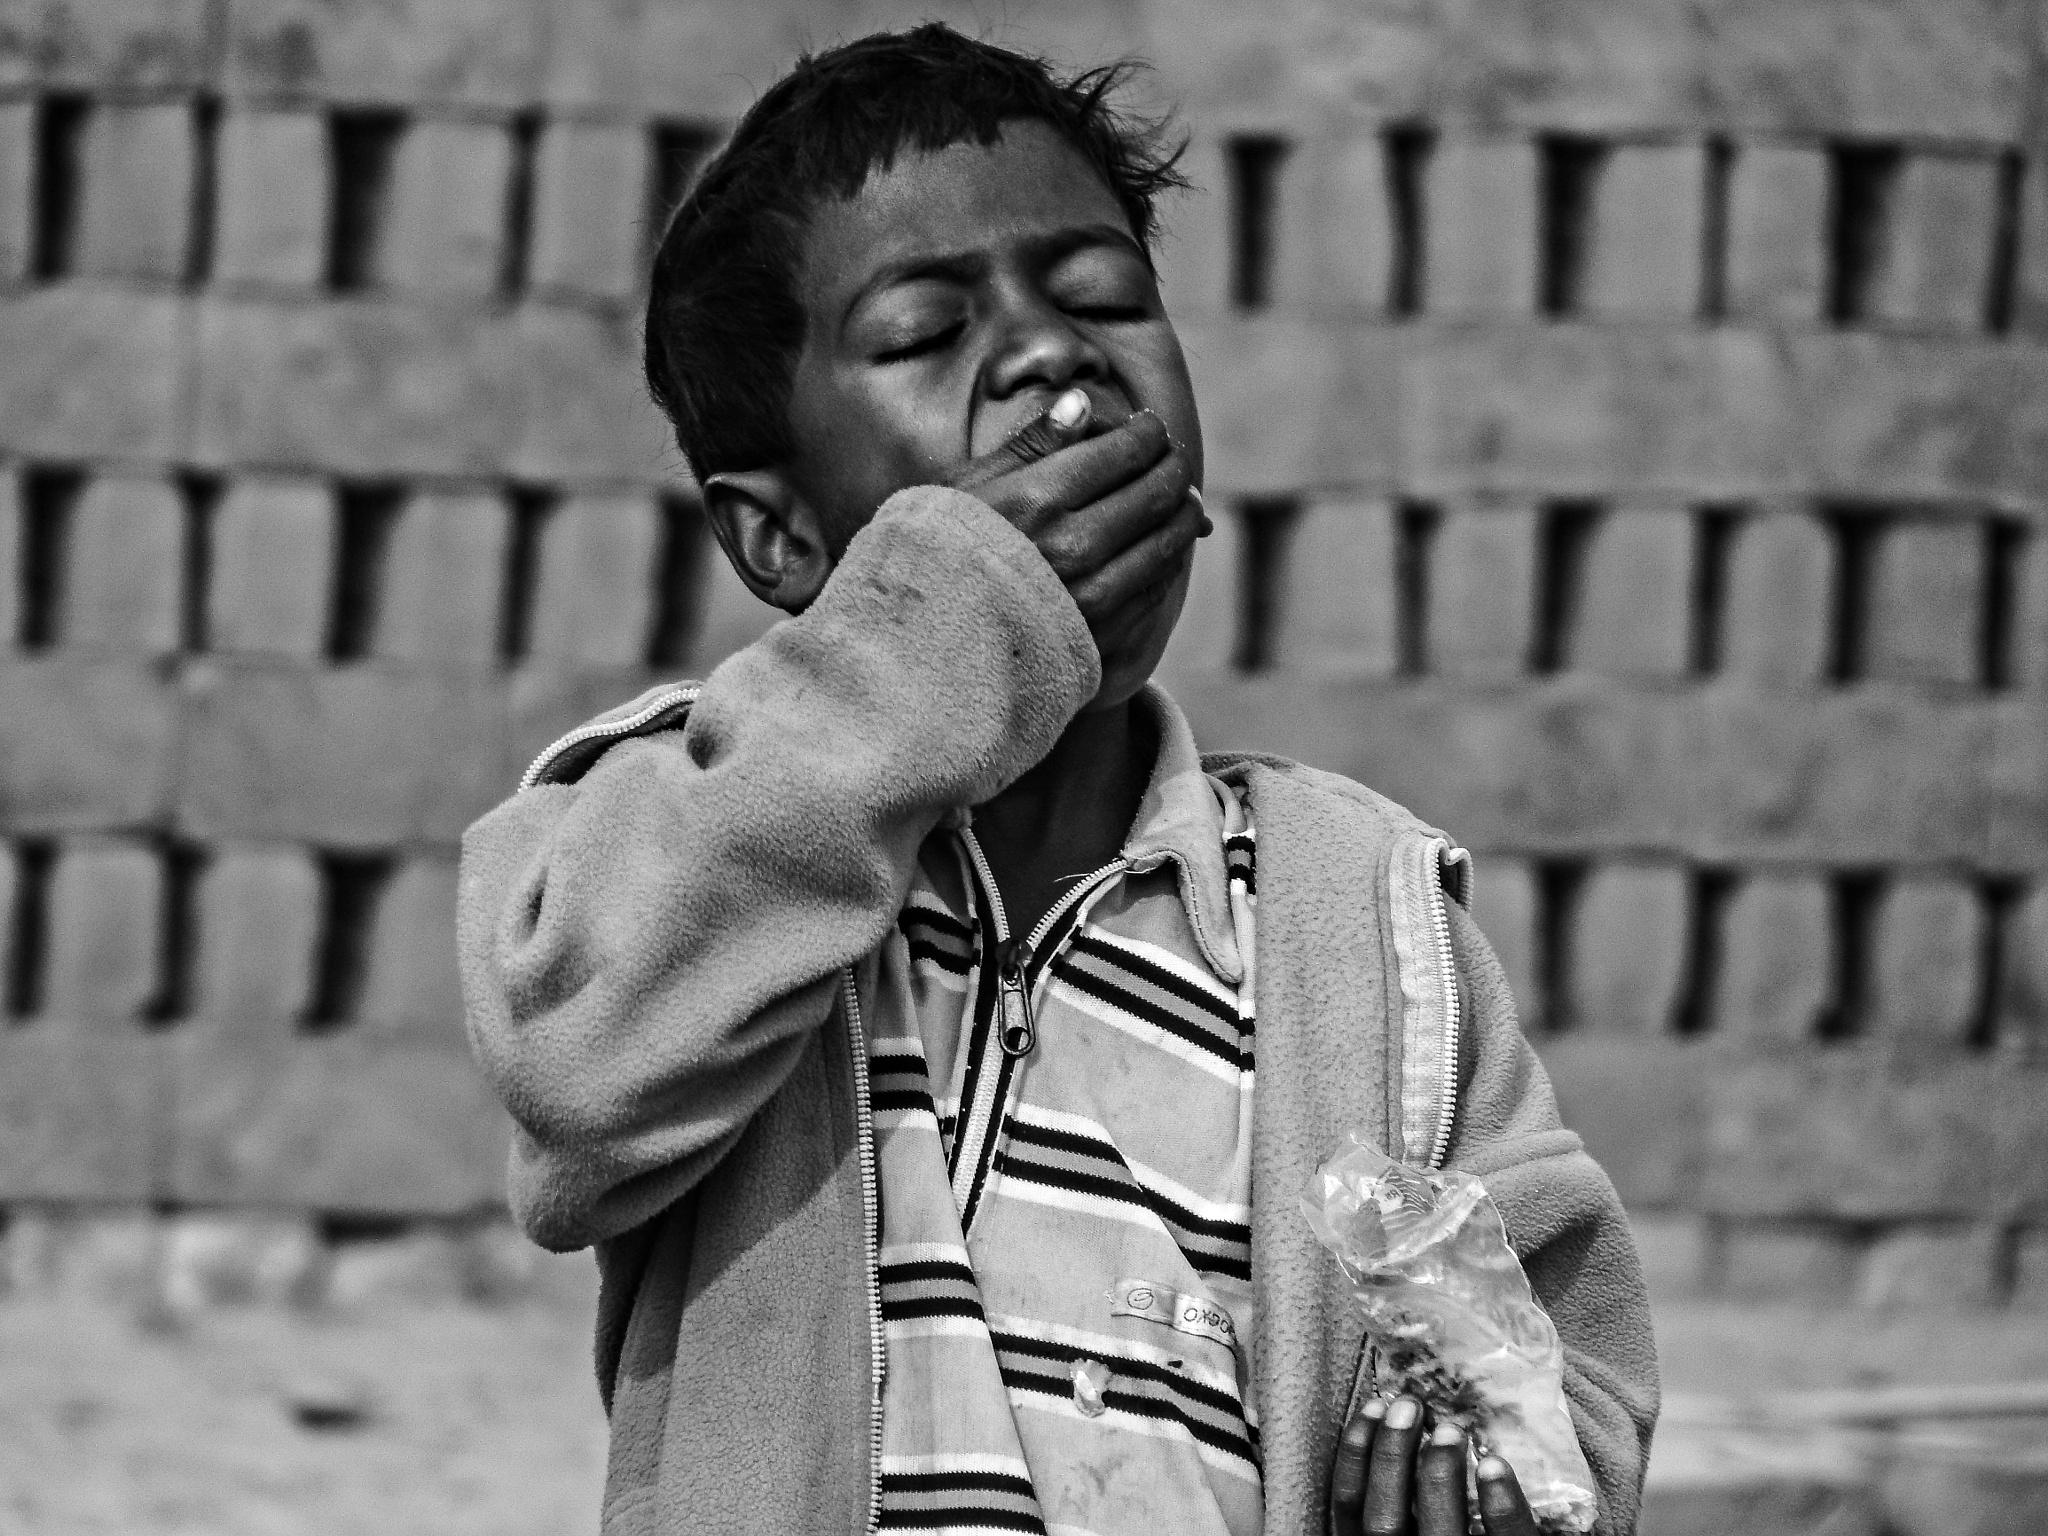 Innocence... by Debraj Das